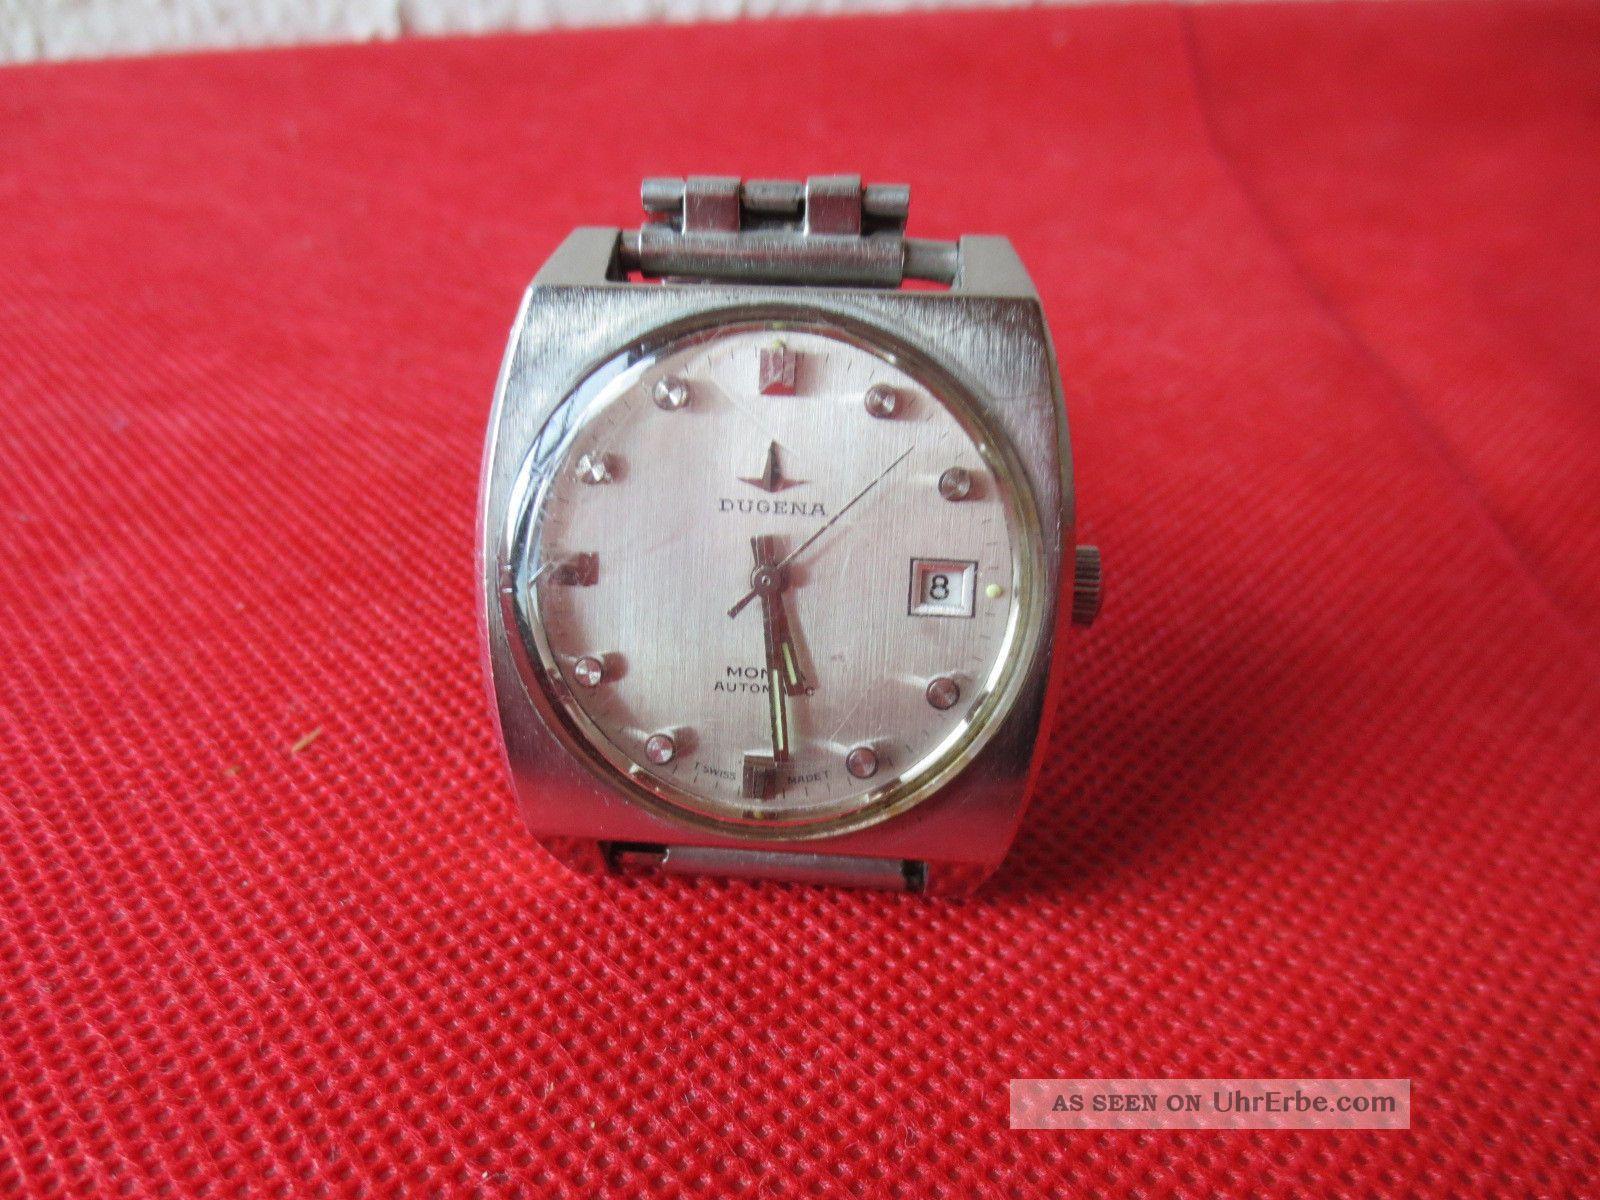 Dugena Monza Automatic Armbanduhr - Swiss Made - Vintage - Wristwatch Selfwinding Armbanduhren Bild